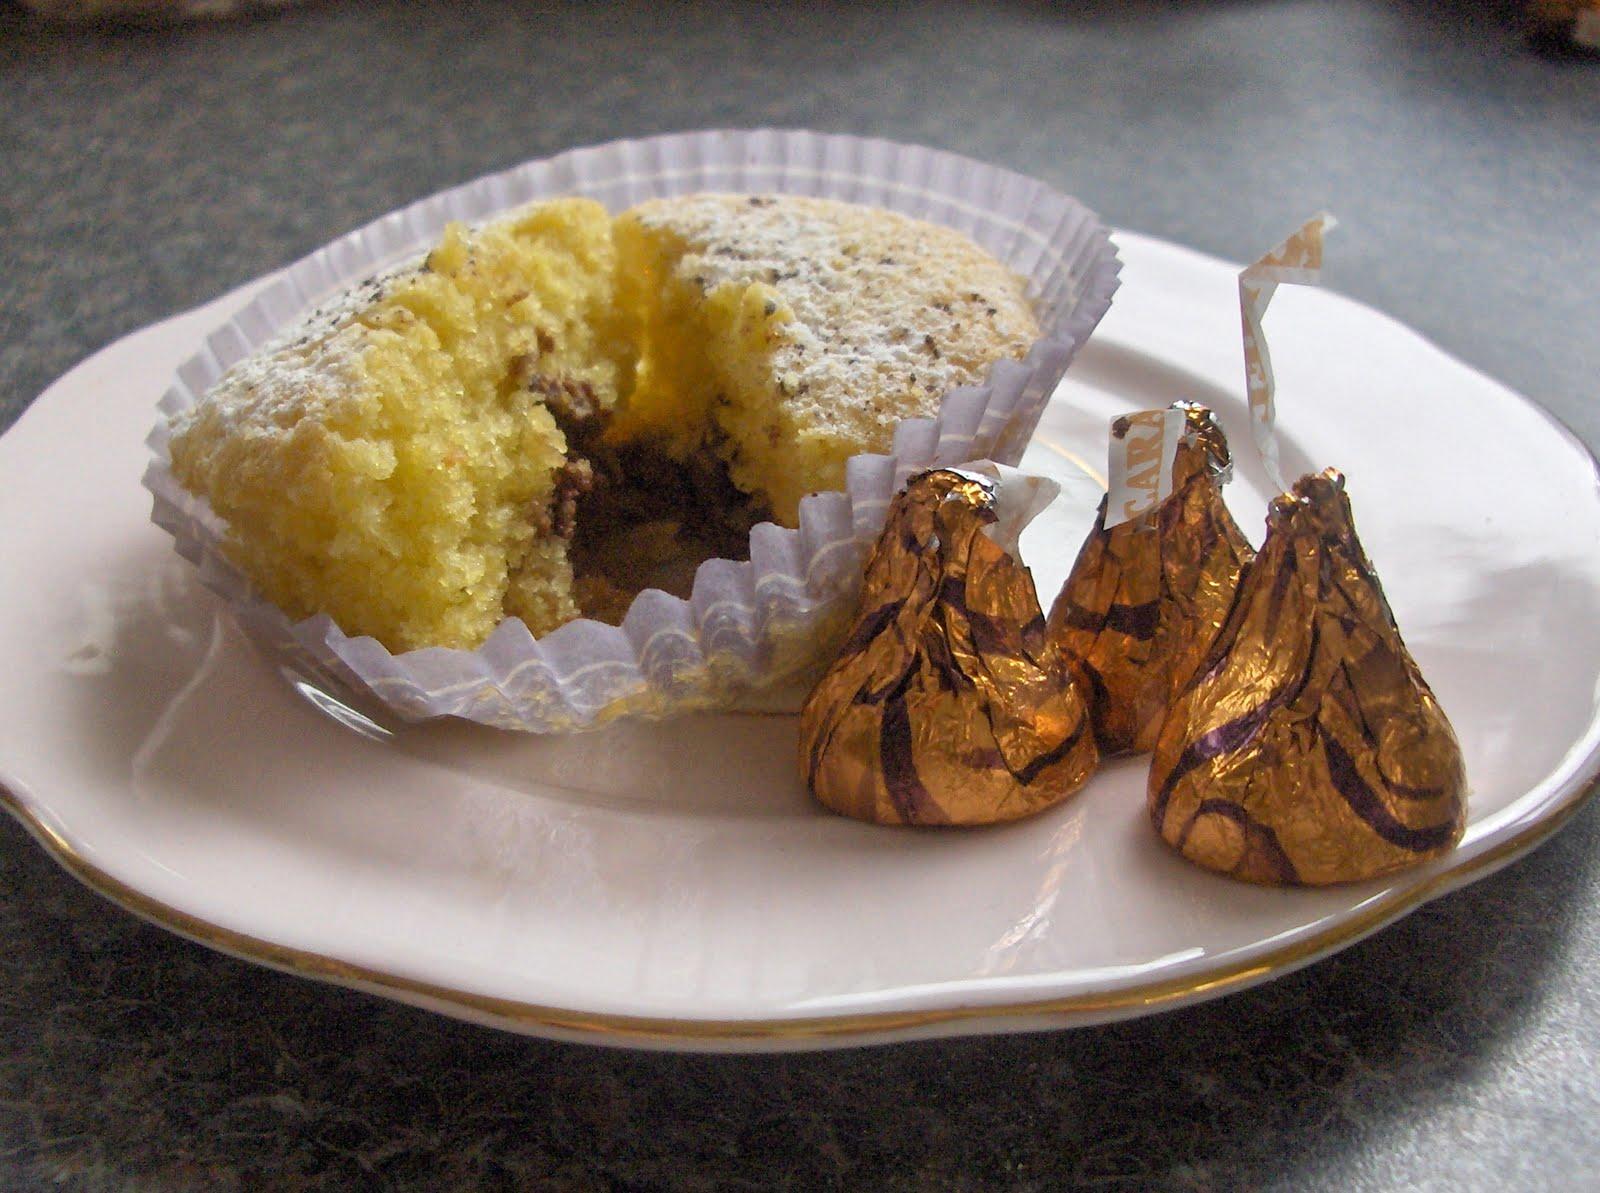 Chocolate Fairy Cake Recipe Using Self Raising Flour